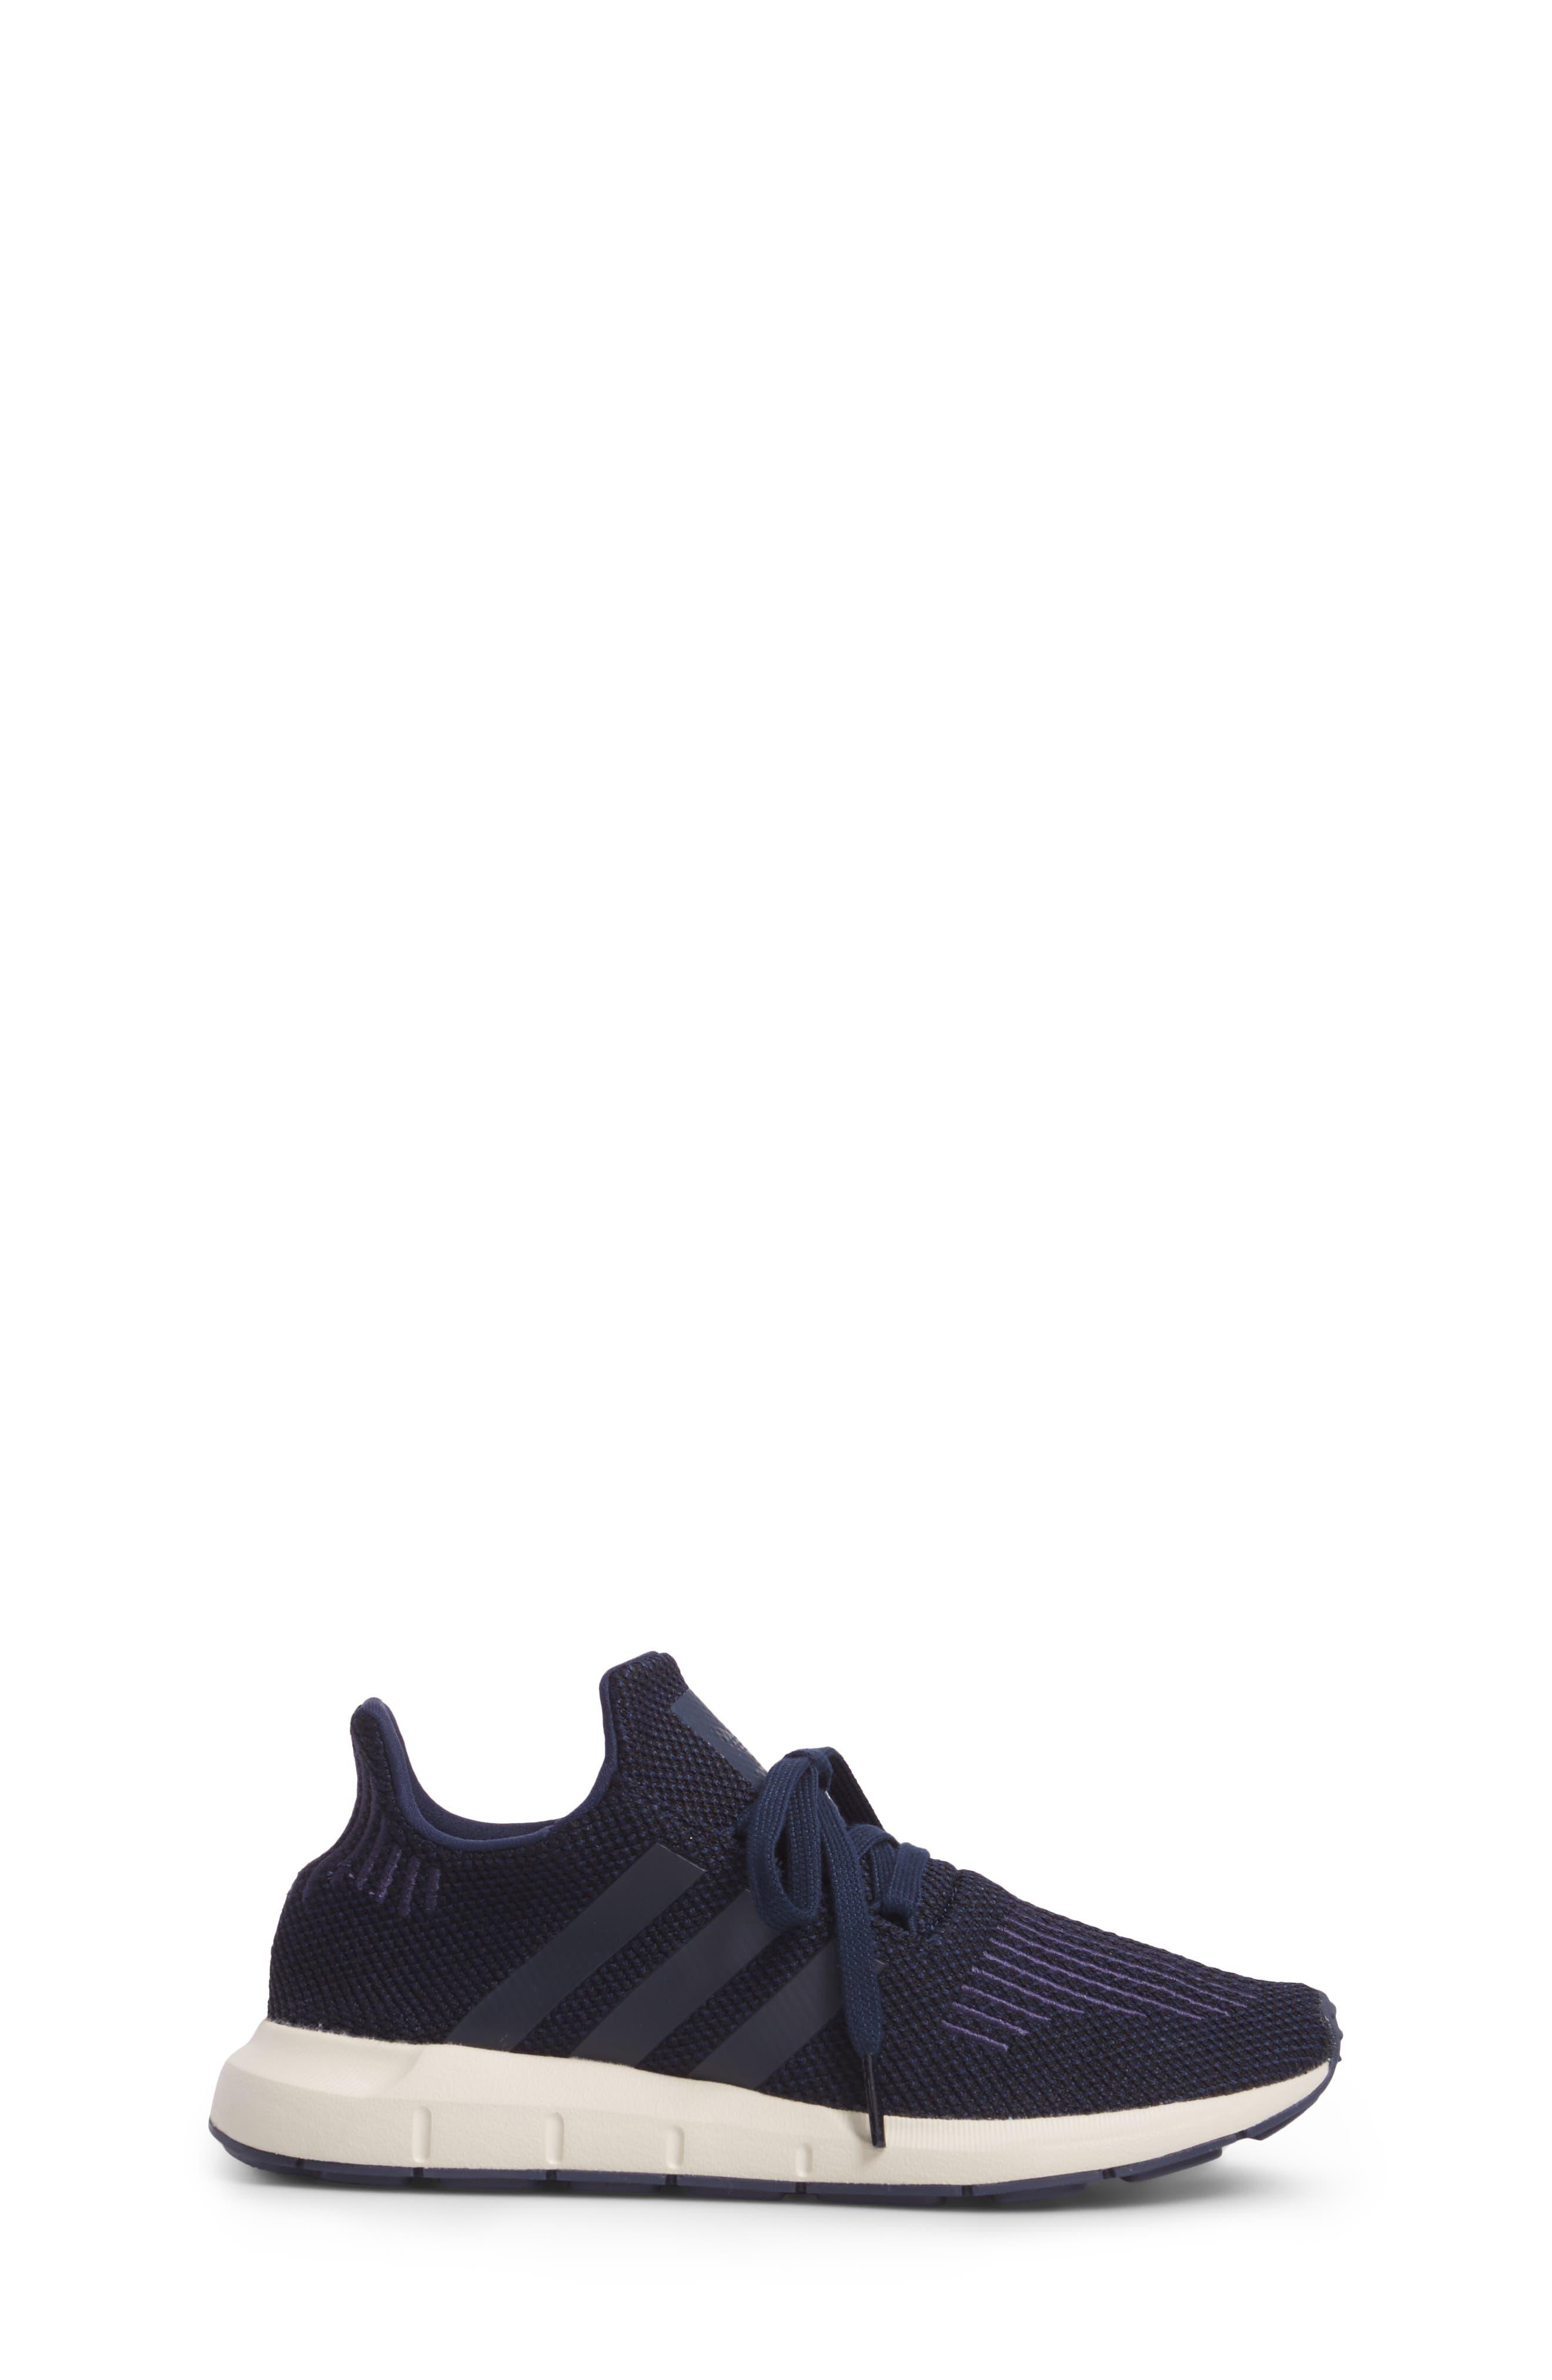 Alternate Image 3  - adidas Swift Run C Sneaker (Baby, Walker, Toddler, Little Kid & Big Kid)